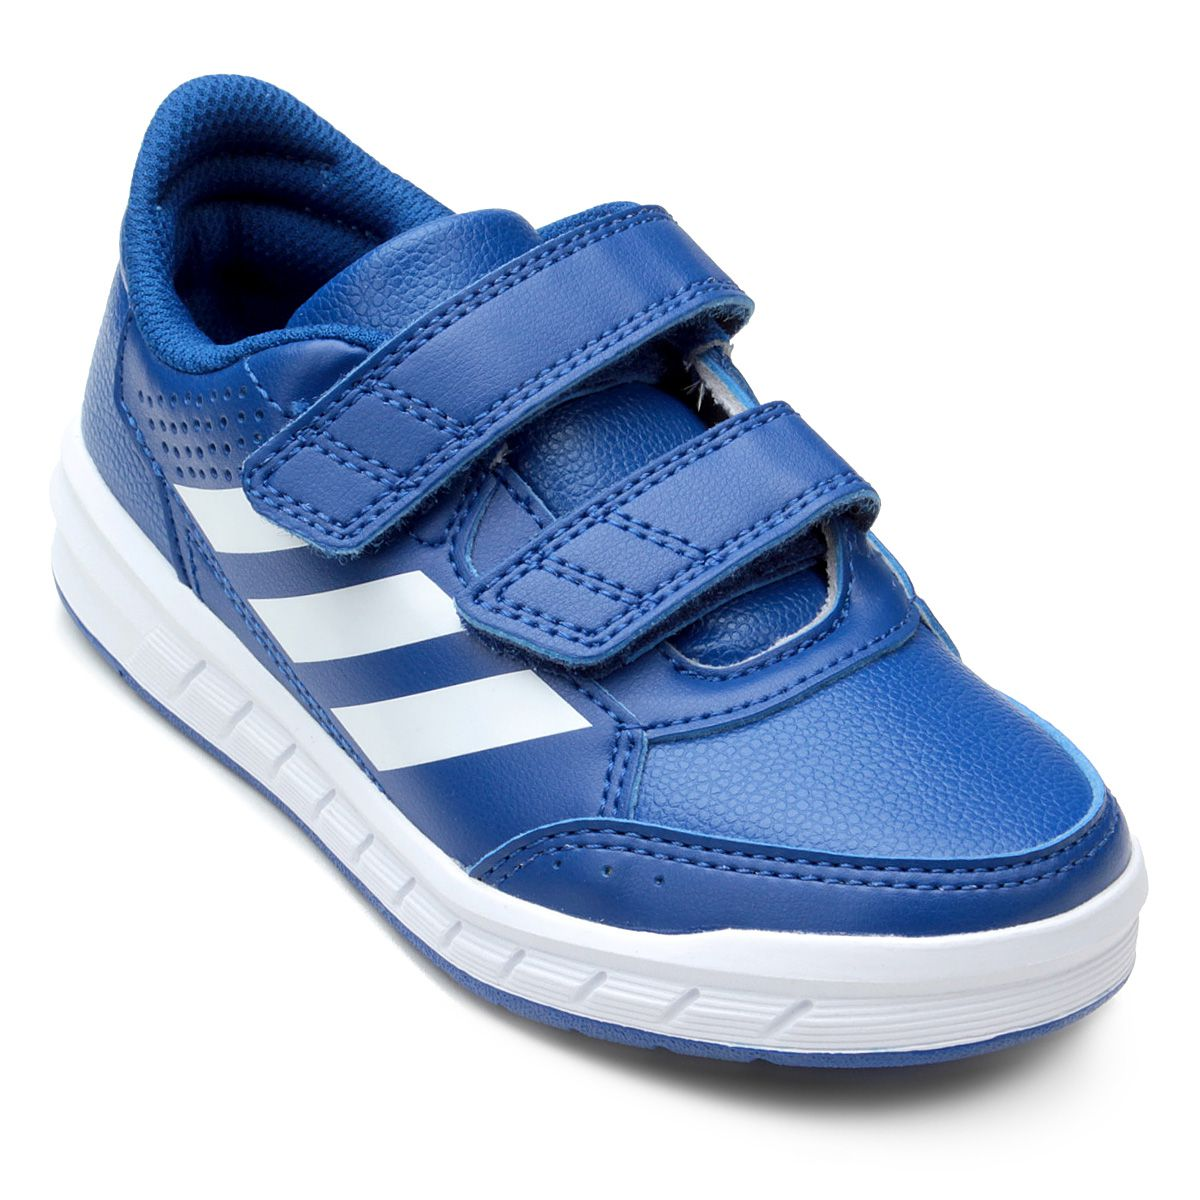 1ee857814 Tênis Adidas Cf Advantage Clean Feminino Rosa Zapatos Adidas